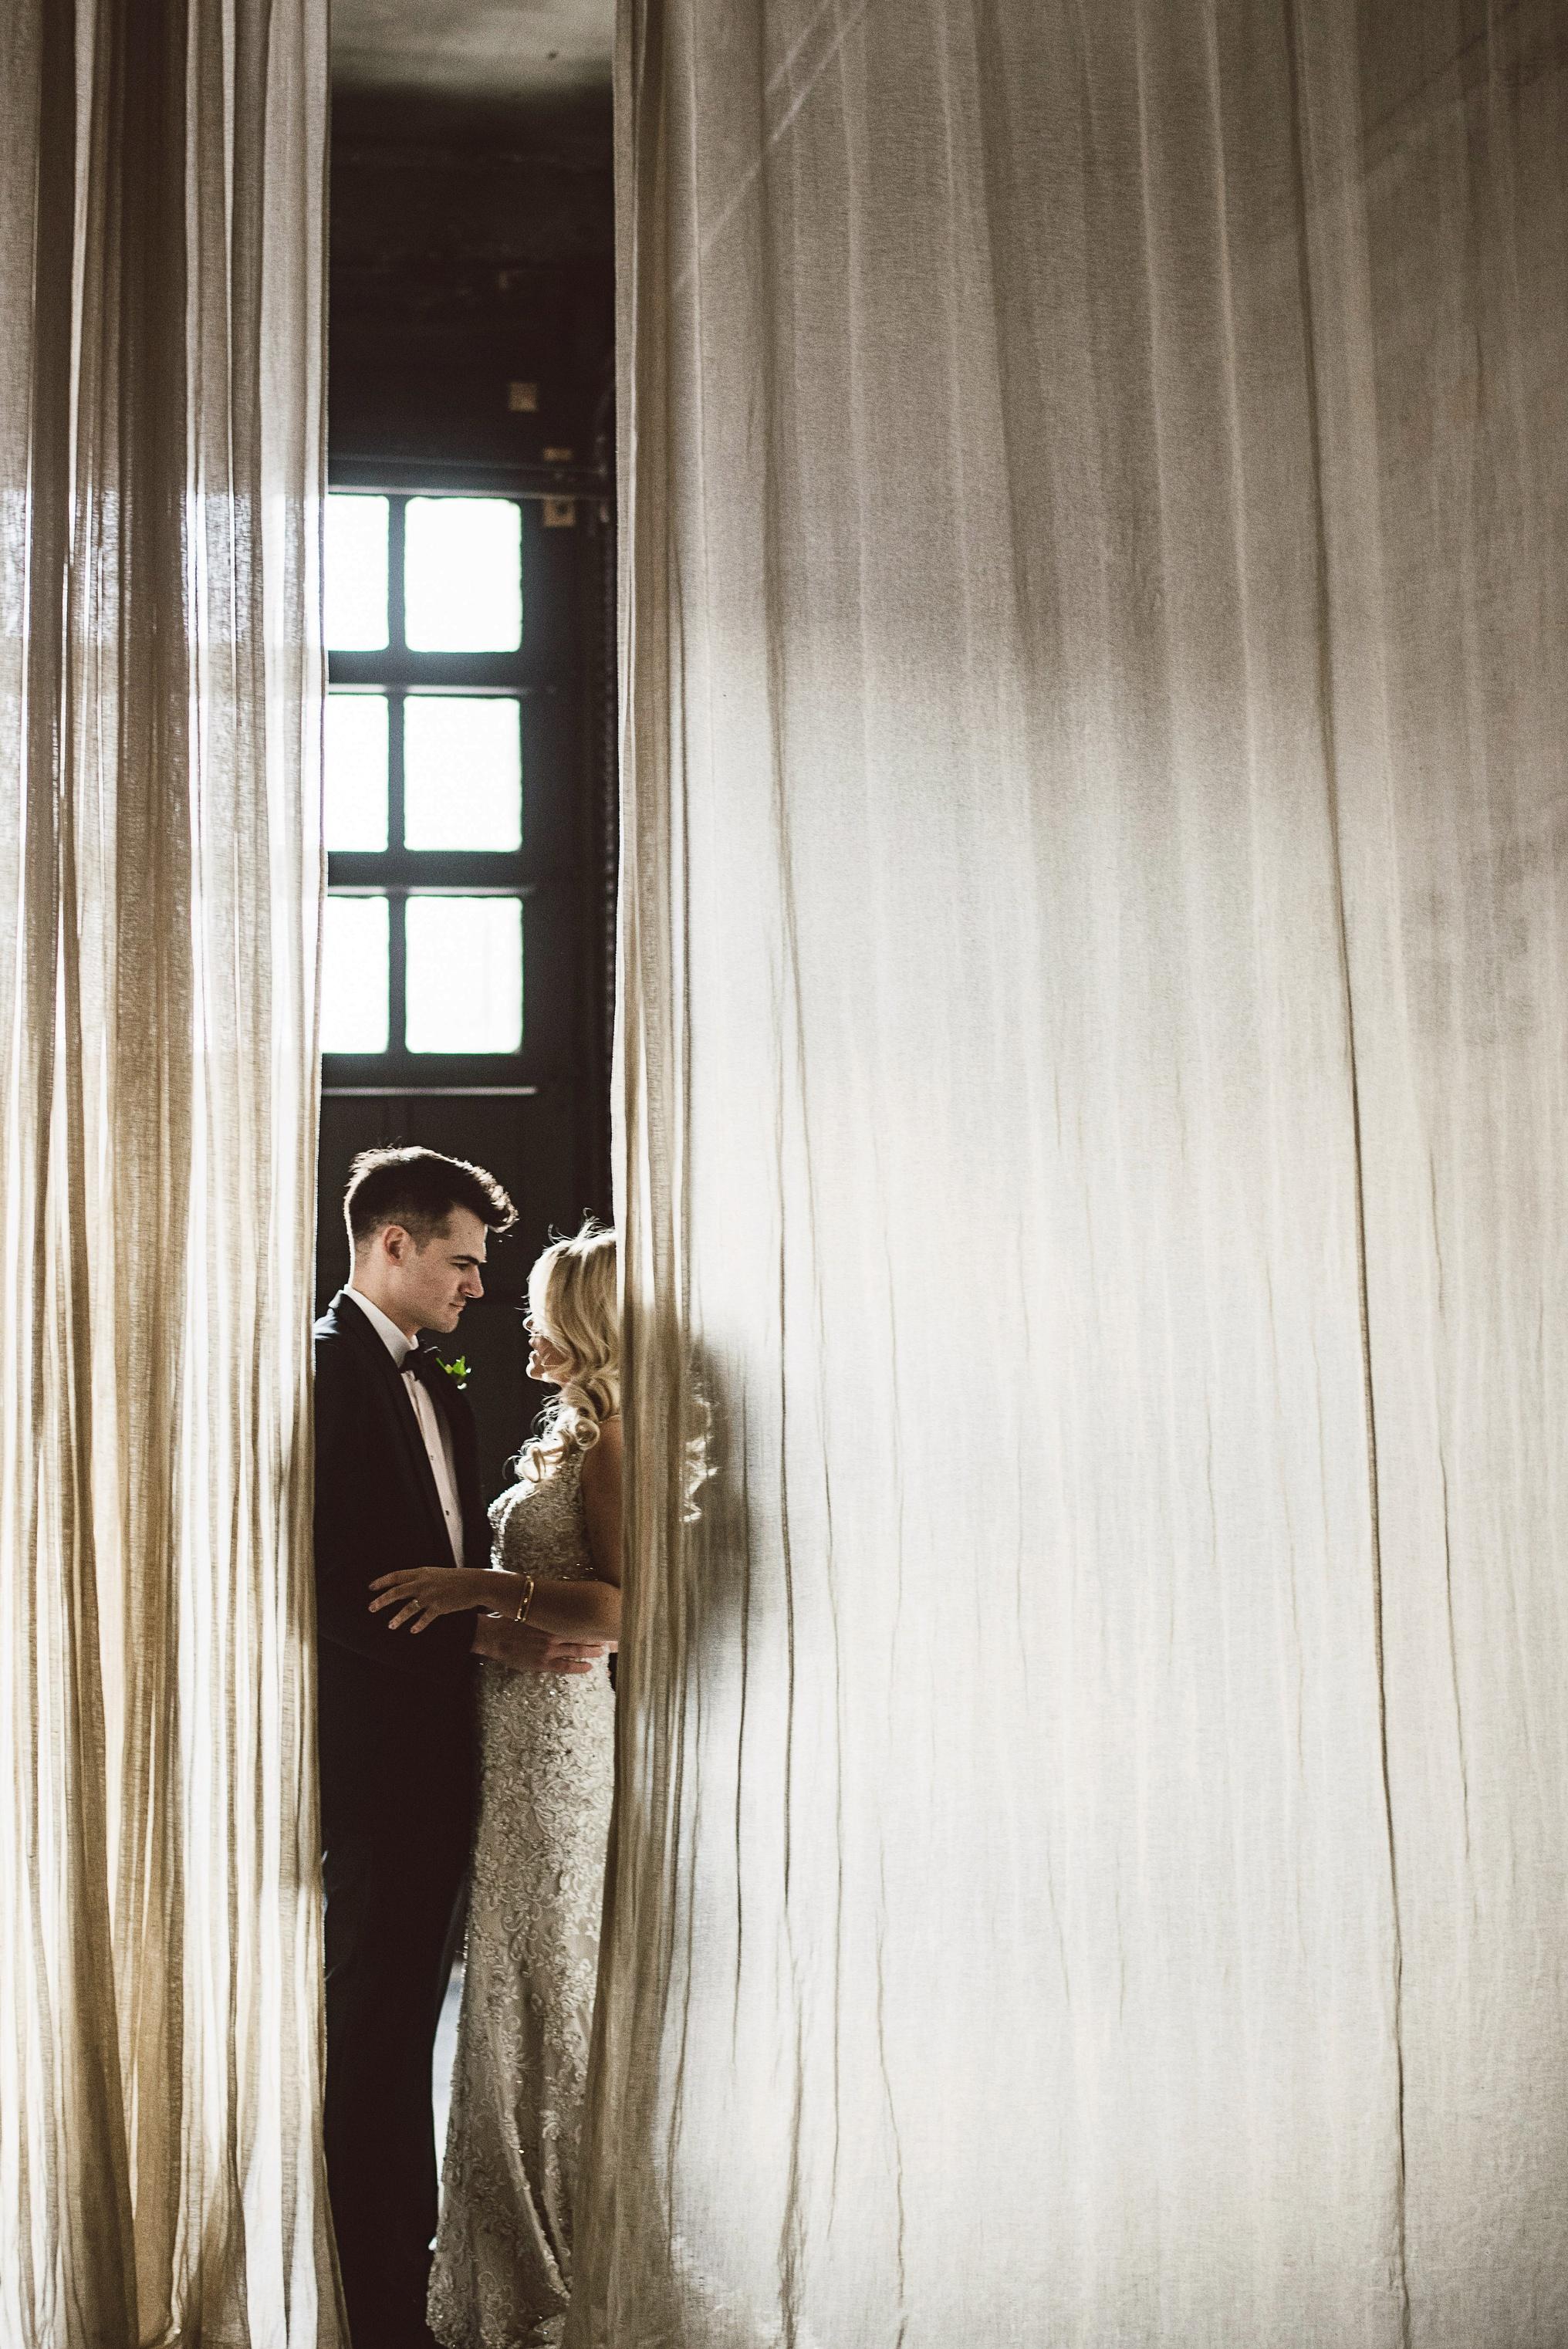 best_wedding_photography_2017_by_lucas_botz_photography_134.jpg